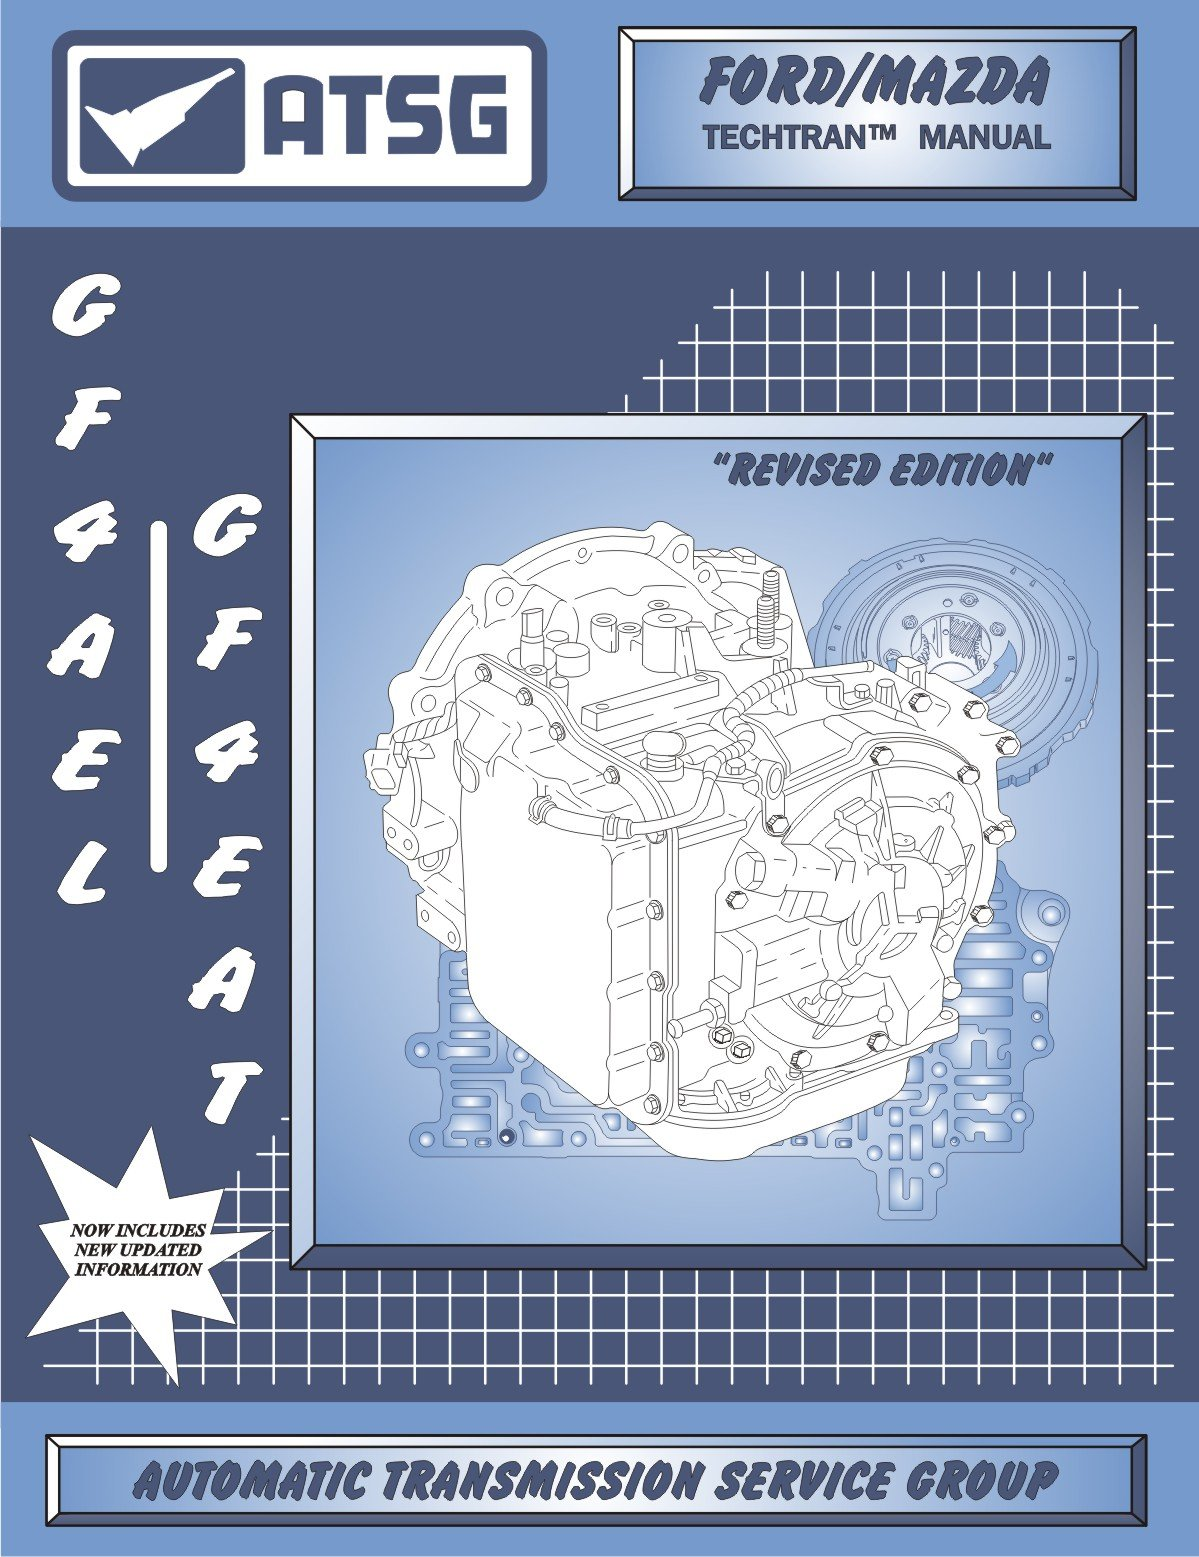 ATSG Mazda GF4AEL GF4EAT Techtran Transmission Rebuild Manual (1993-1994): Automatic  Transmission Service Group: Amazon.com: Books